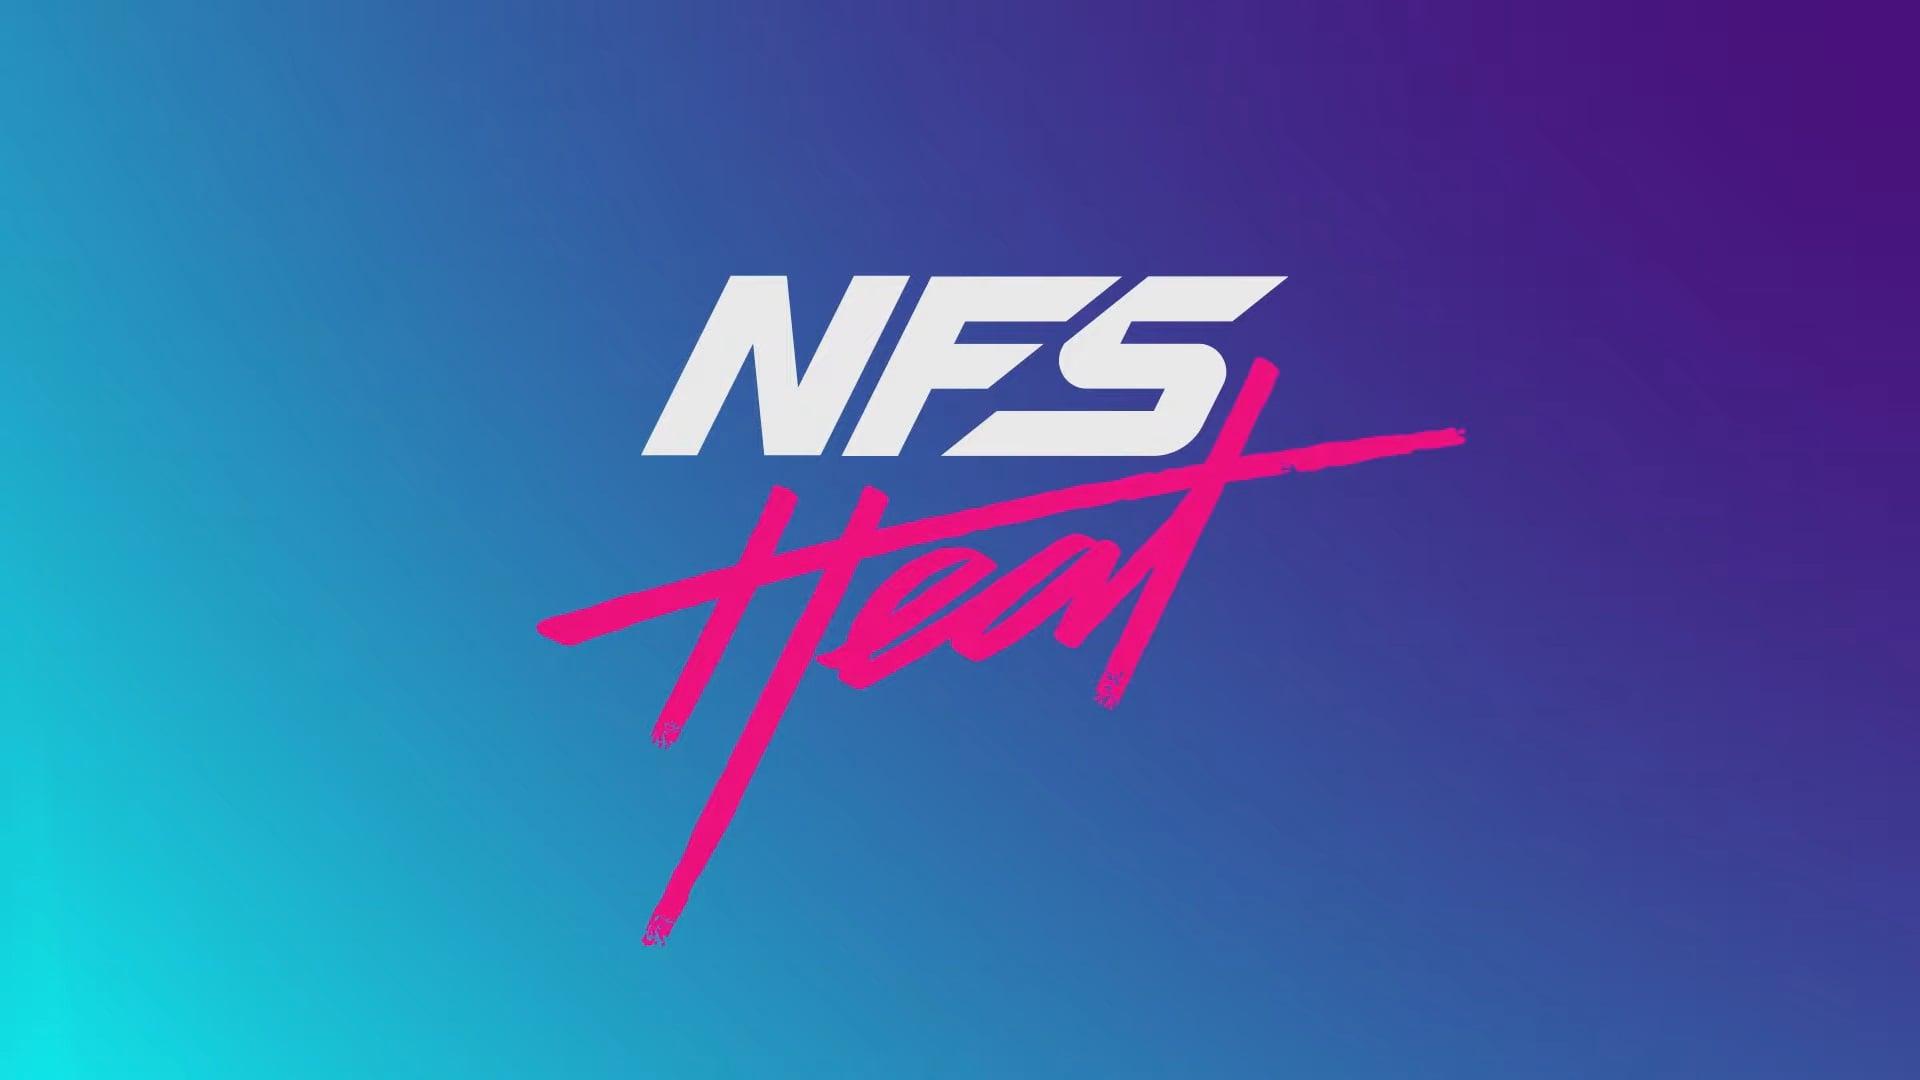 Nfs heat deluxe edition